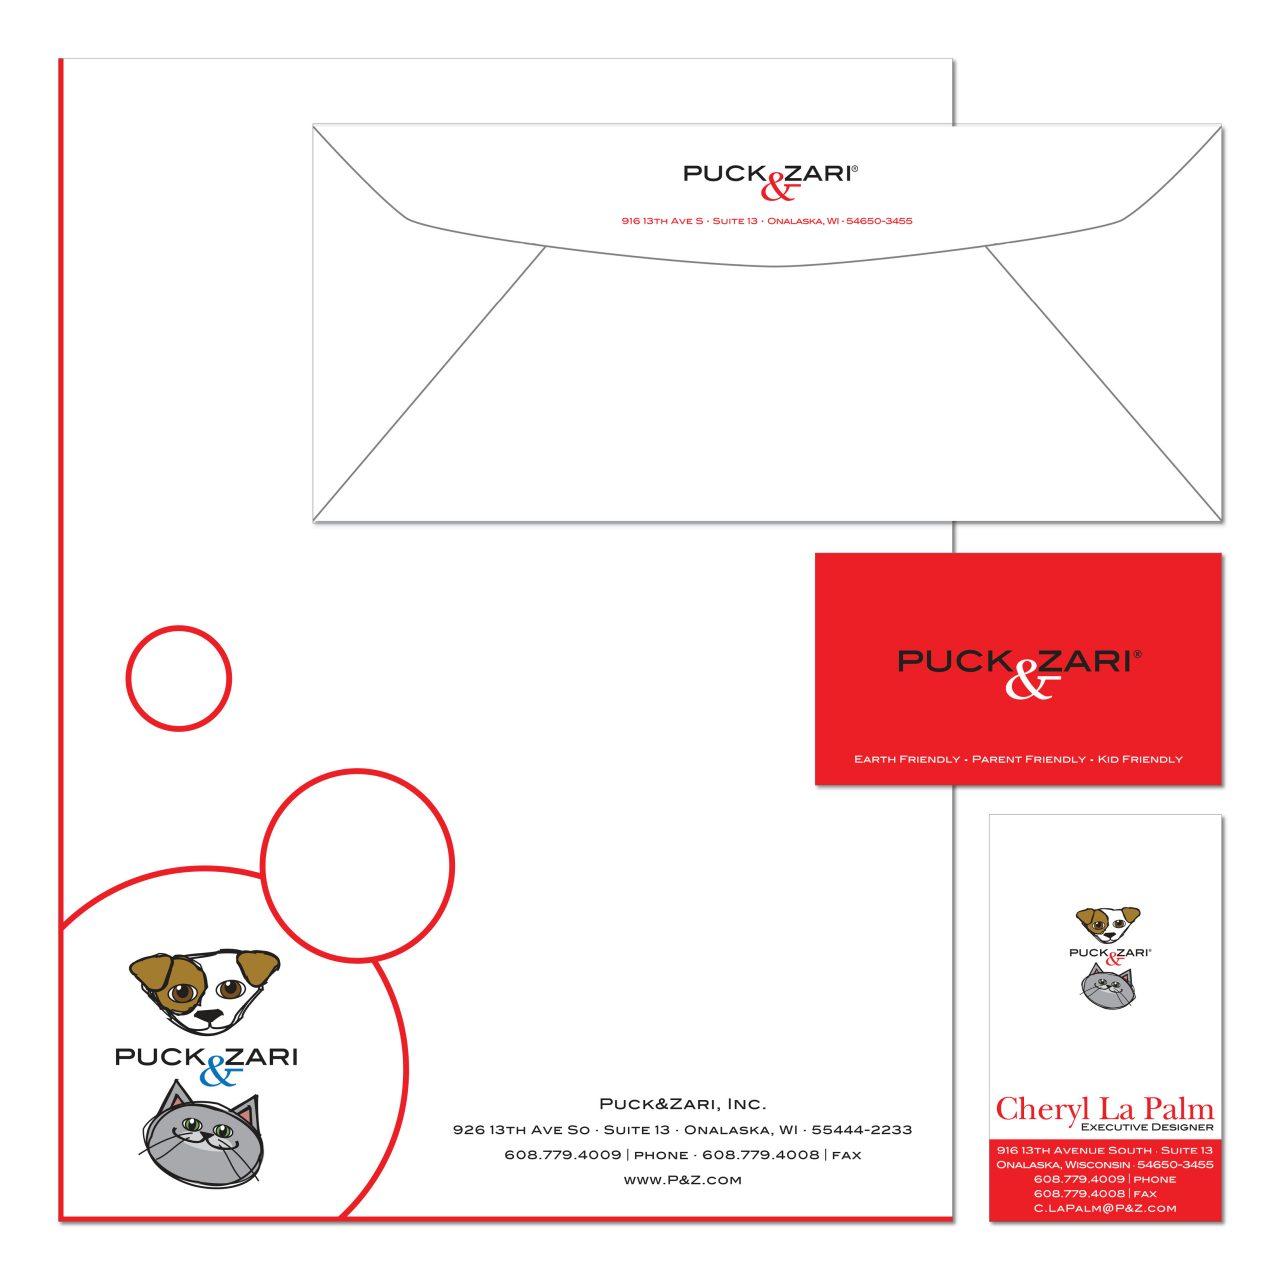 2001 | Puck & Zari | logo, business card, letterhead, envelope